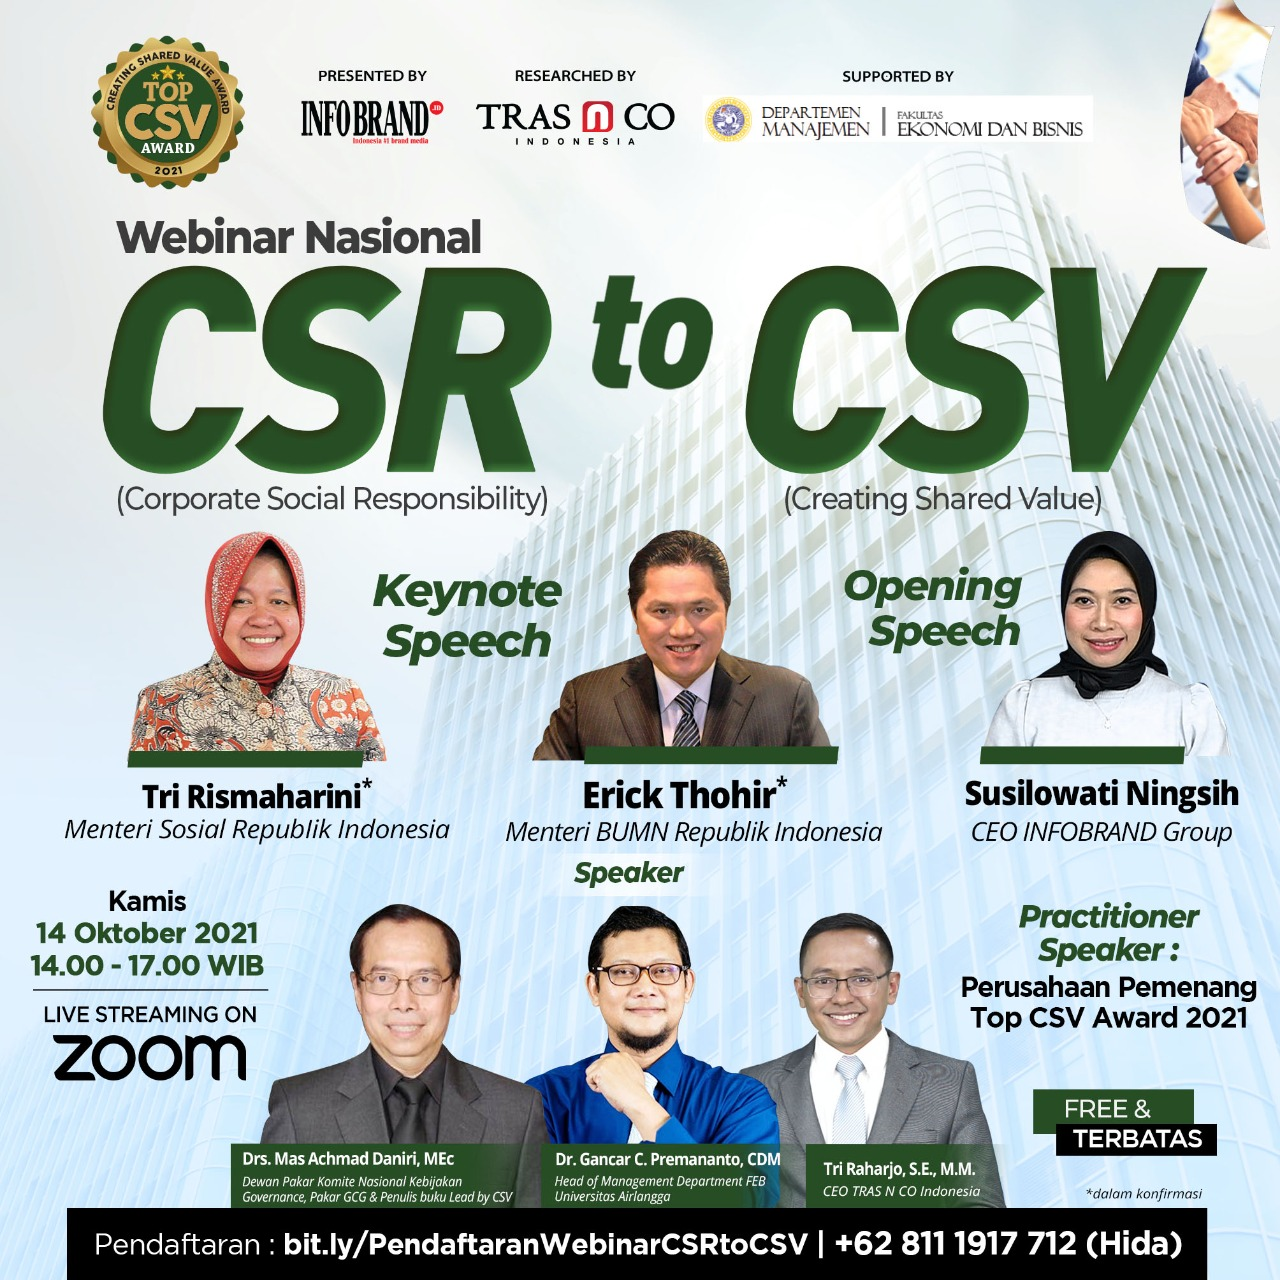 WEBINAR NASIONAL CSR TO CSV